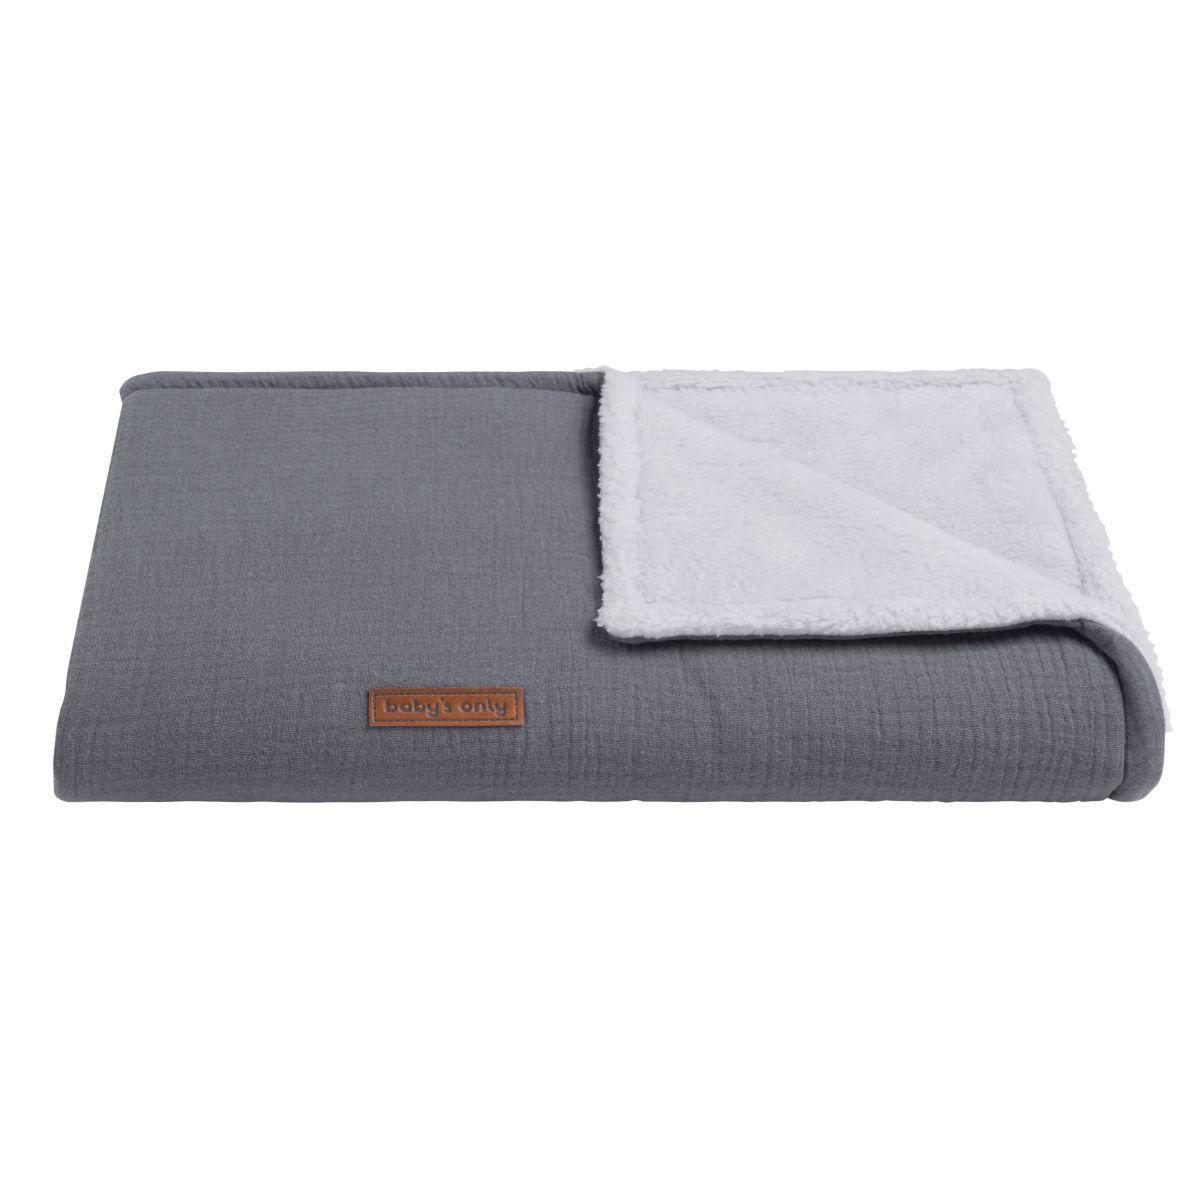 cot blanket teddy breeze anthracite